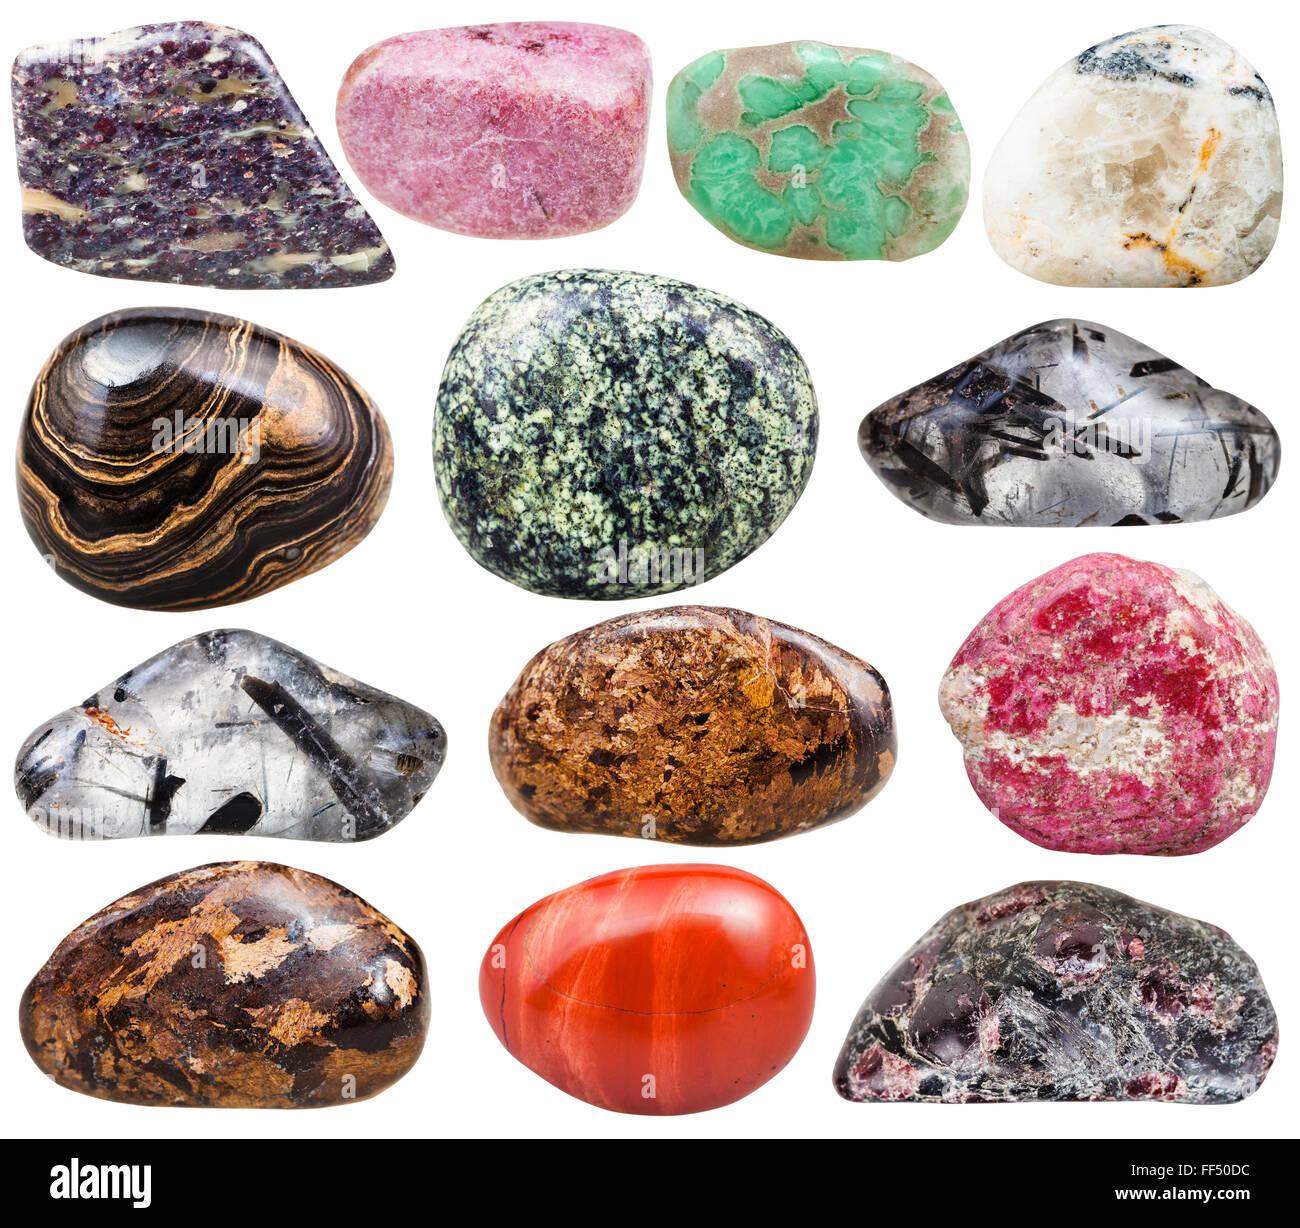 collection of natural mineral tumbled gemstones - bronzite, quartz, variscite, thulite, rosaline, zoisite, red jasper, - Stock Image